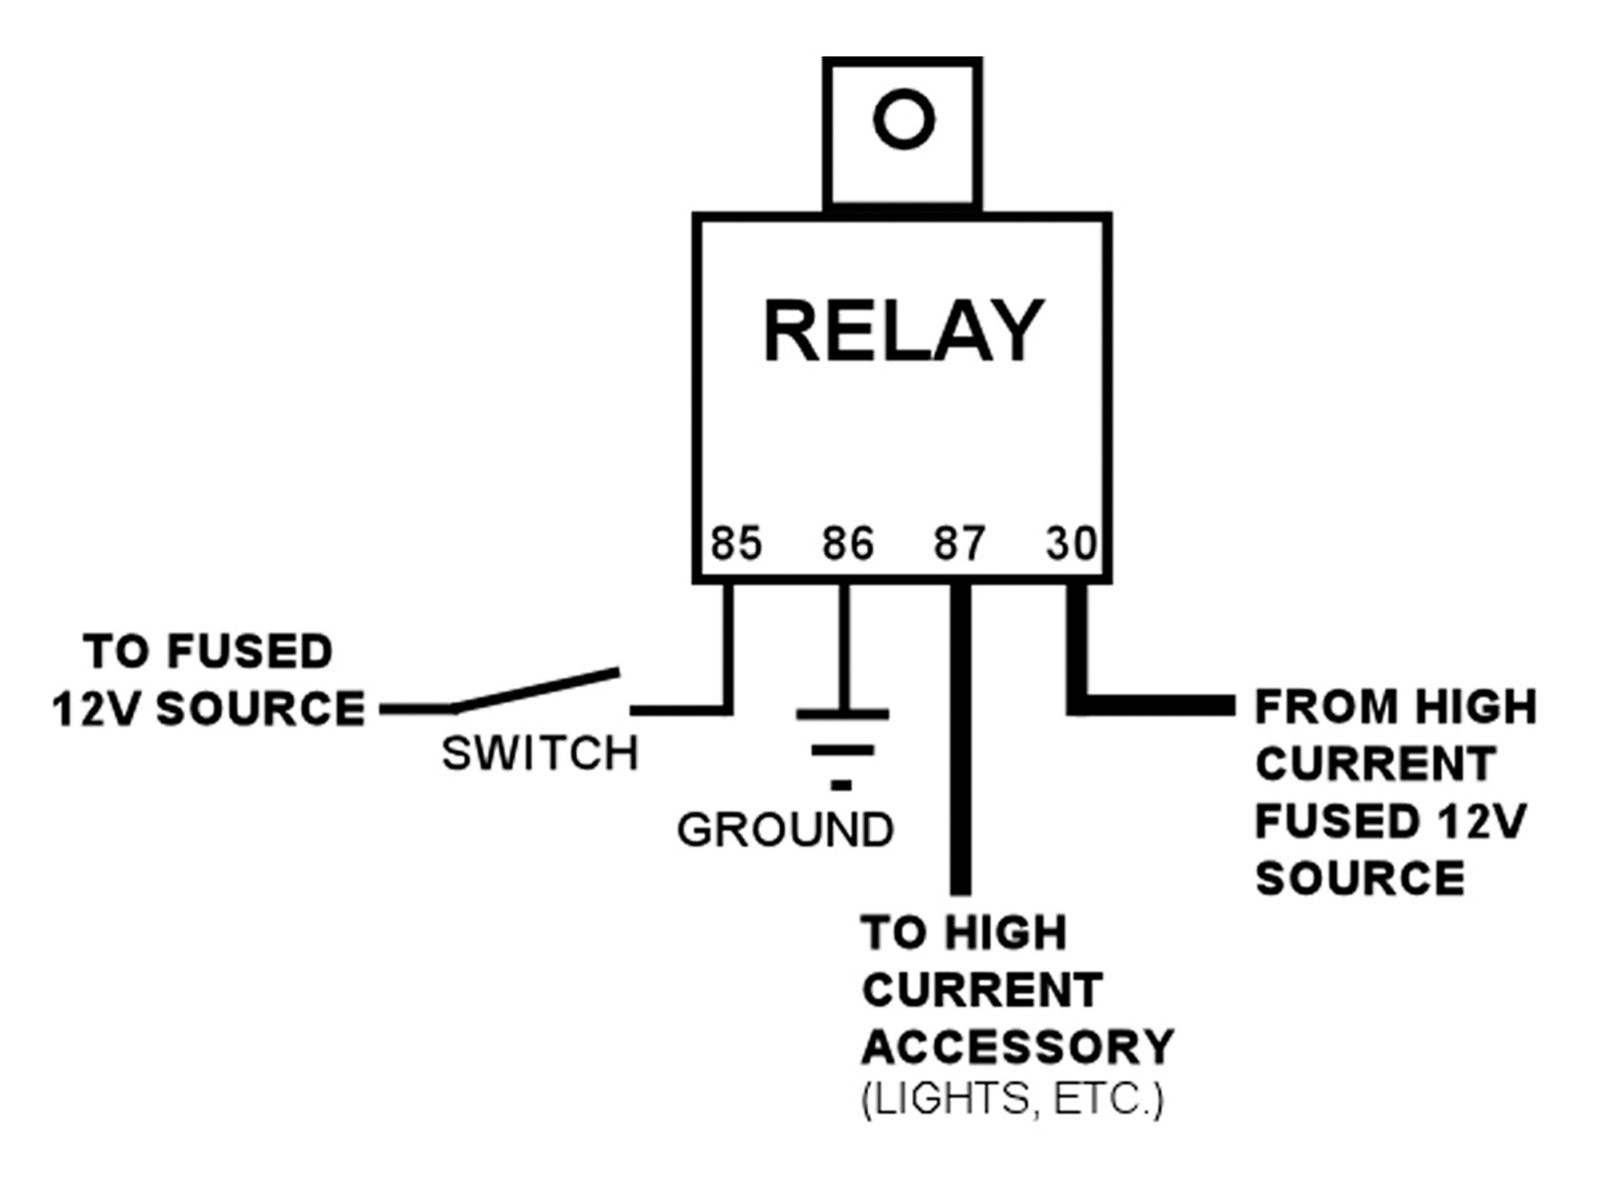 basic relay elements